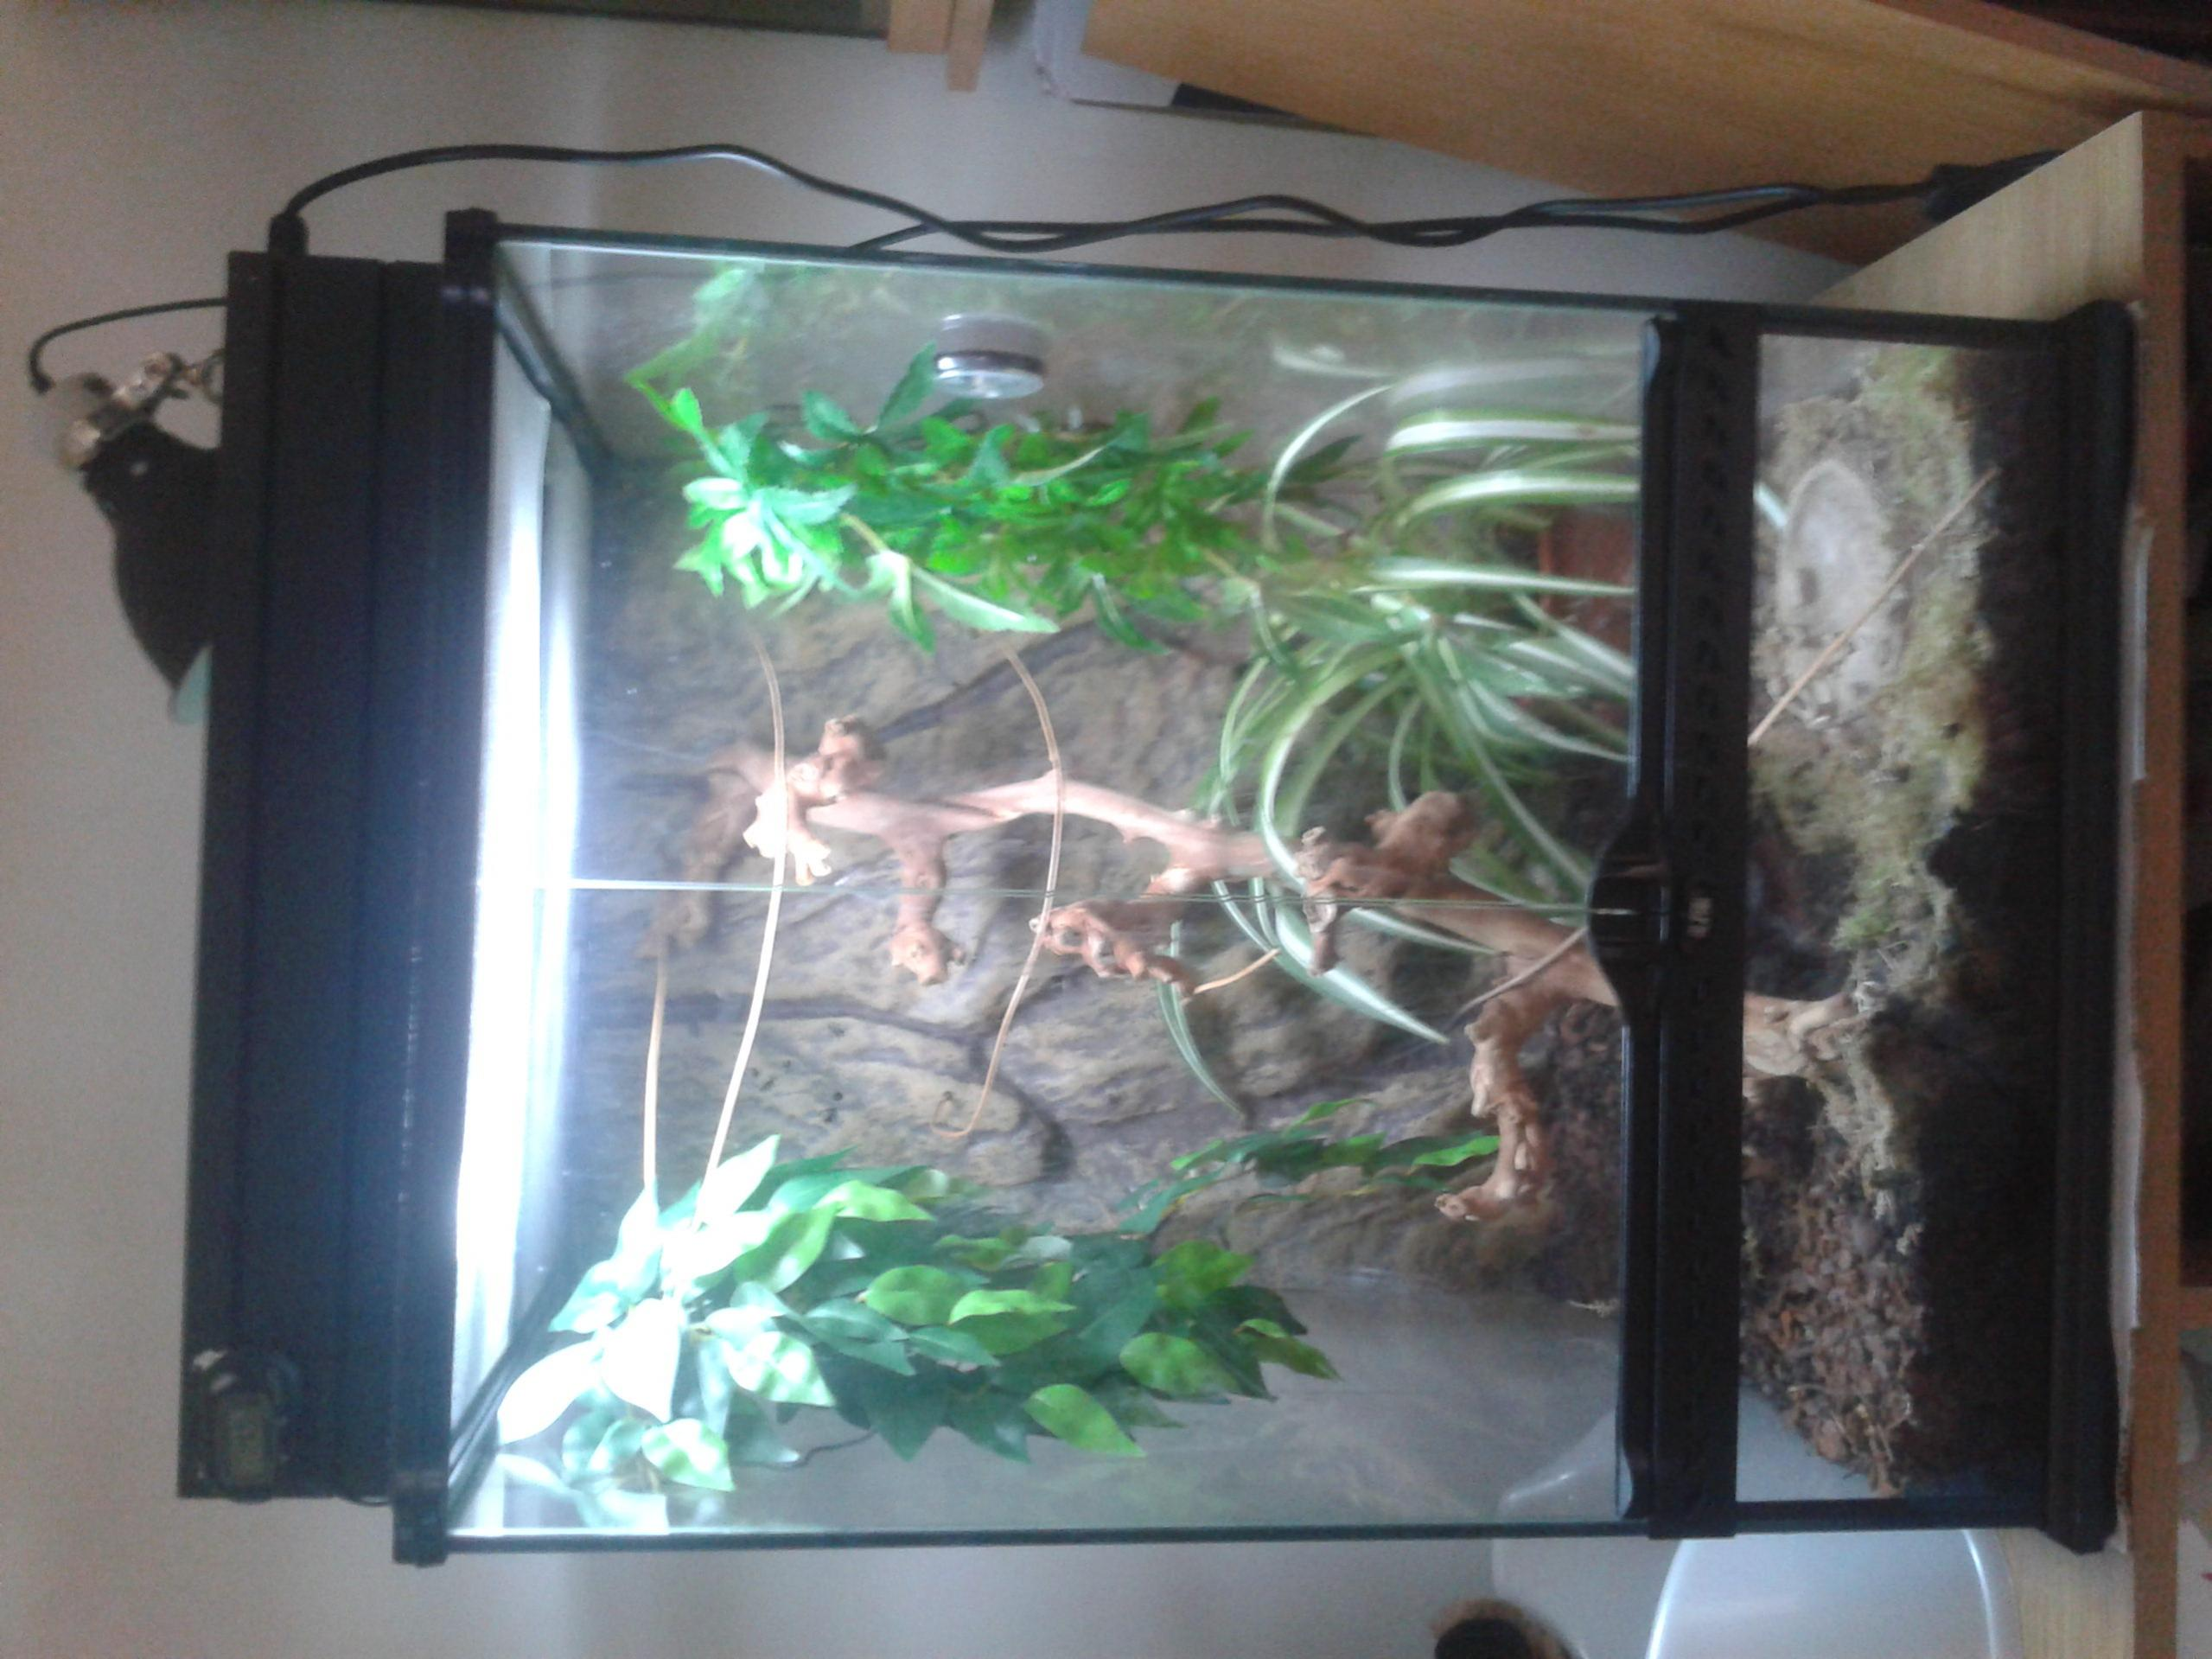 Eastern yemen chameleon/setup large exo terra terrarium - Reptile ...